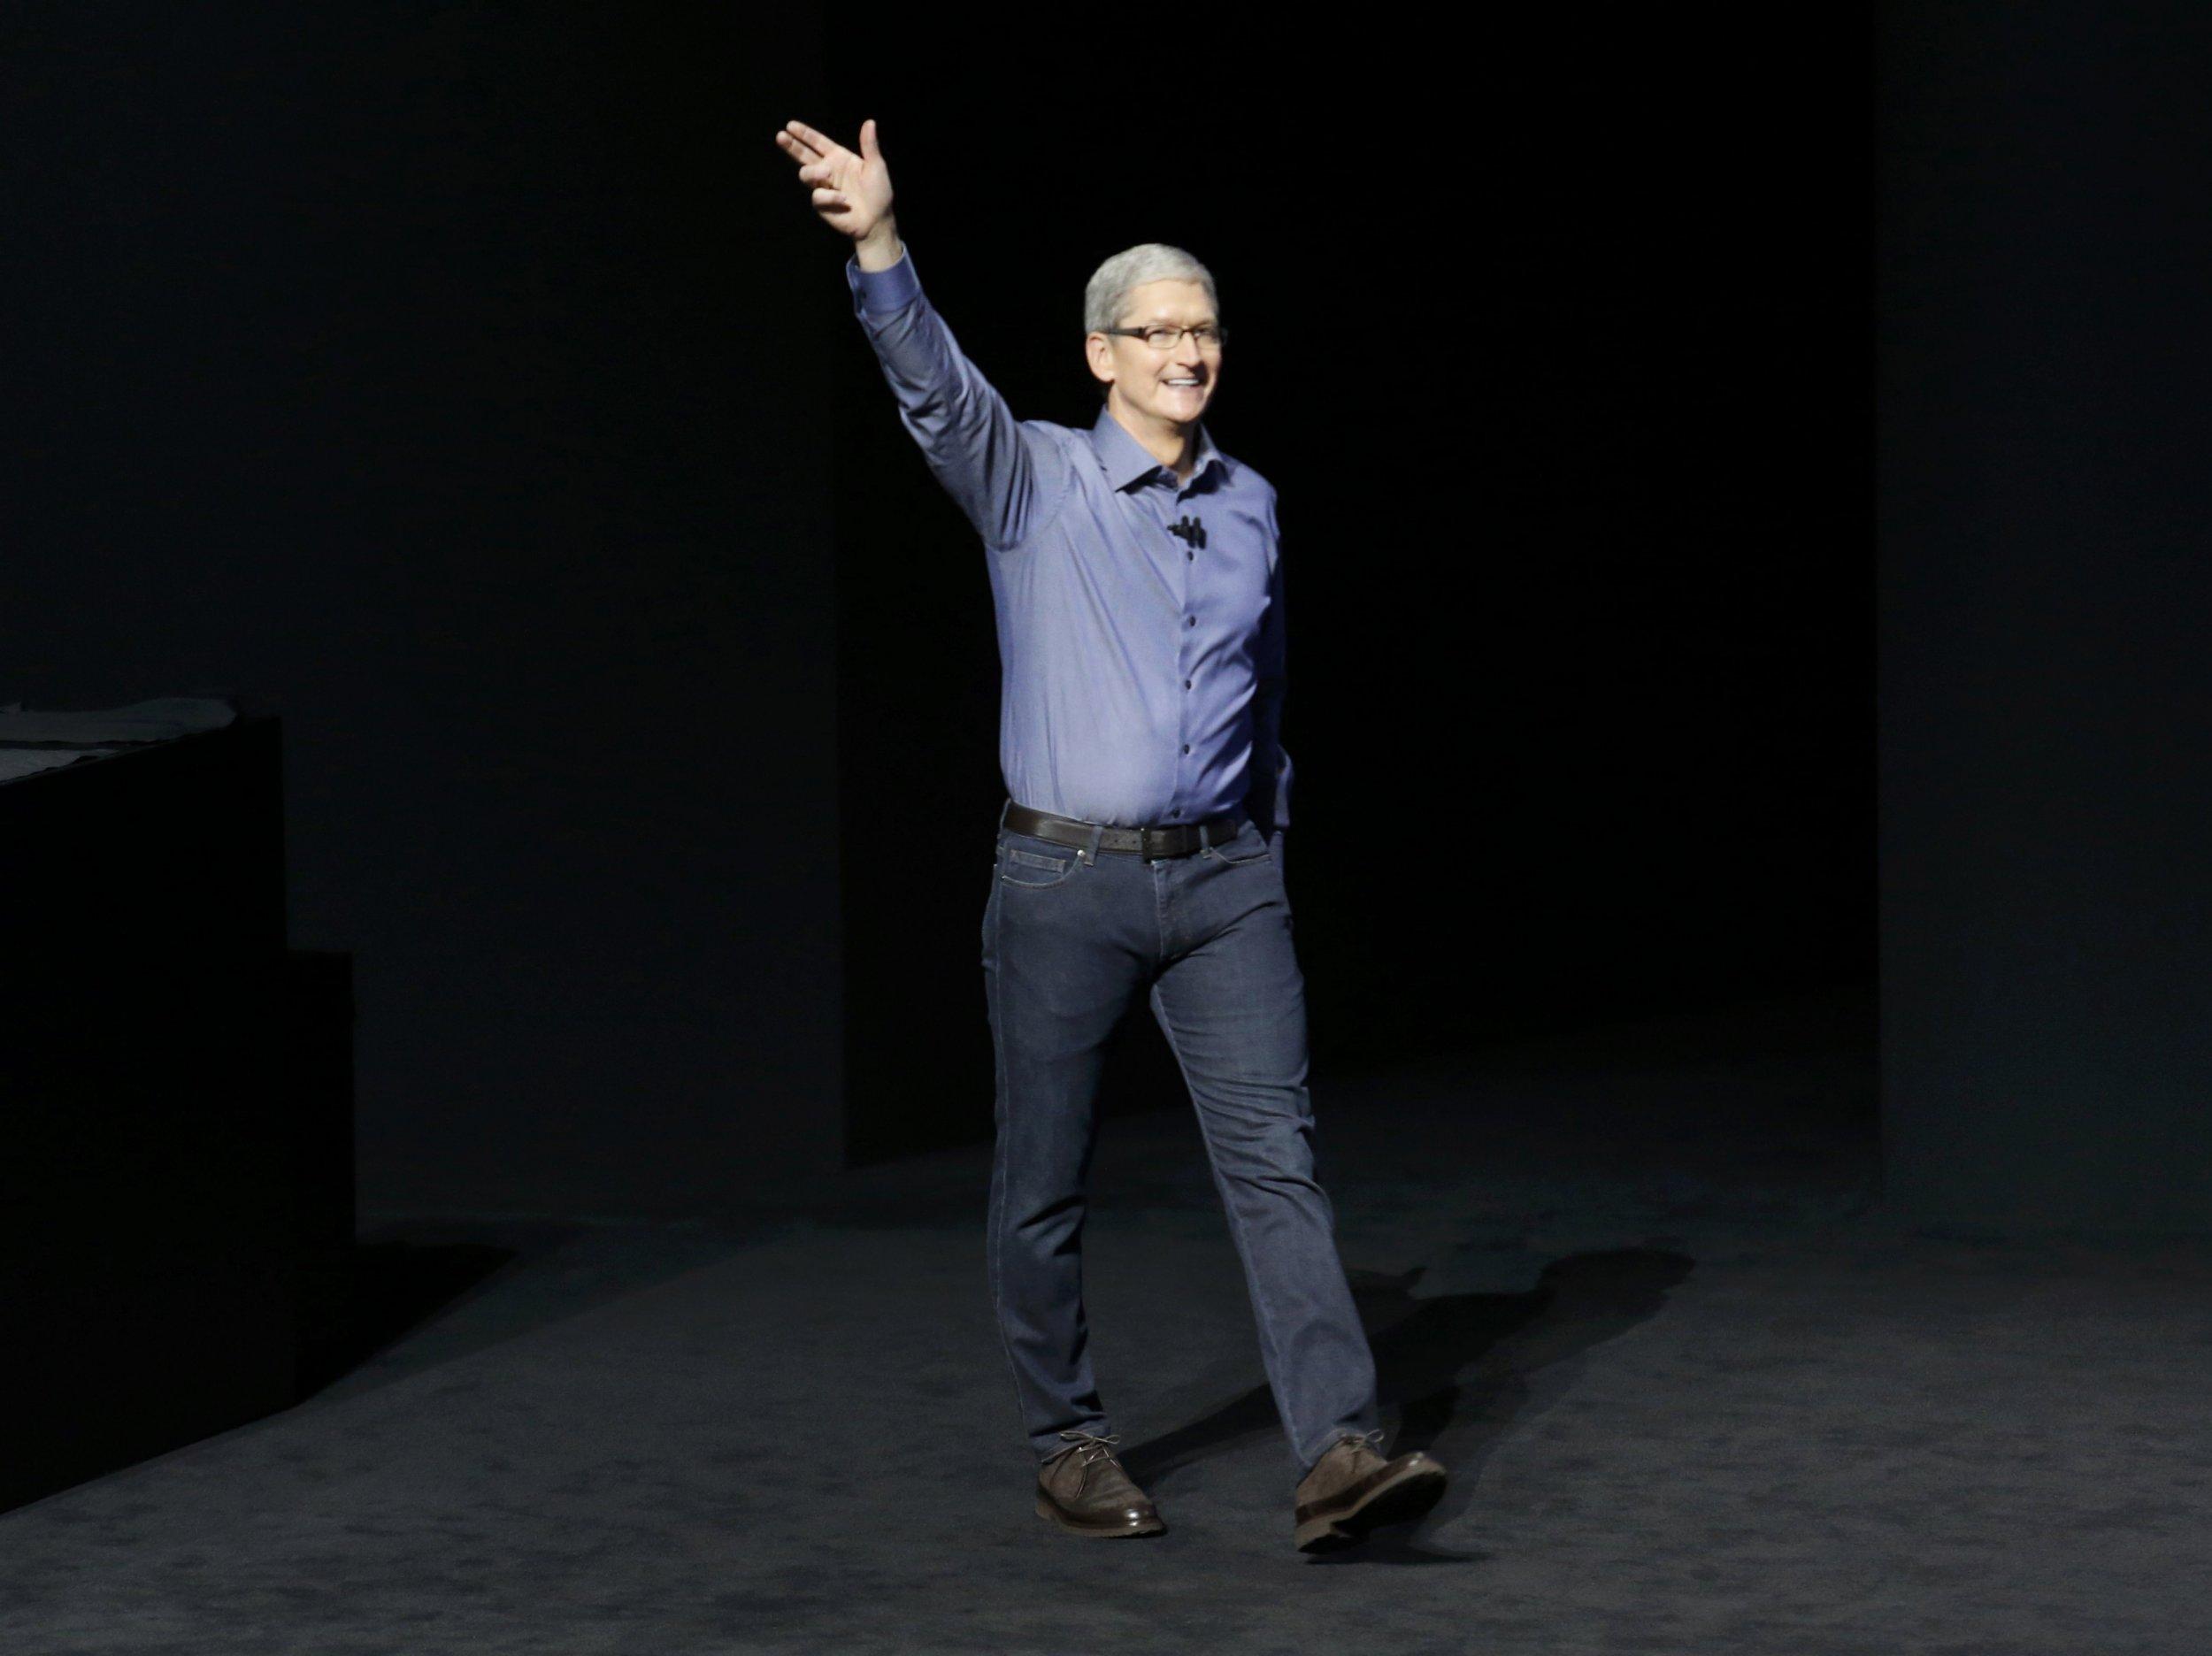 Tim Cook Apple Announcement 9 9 2015